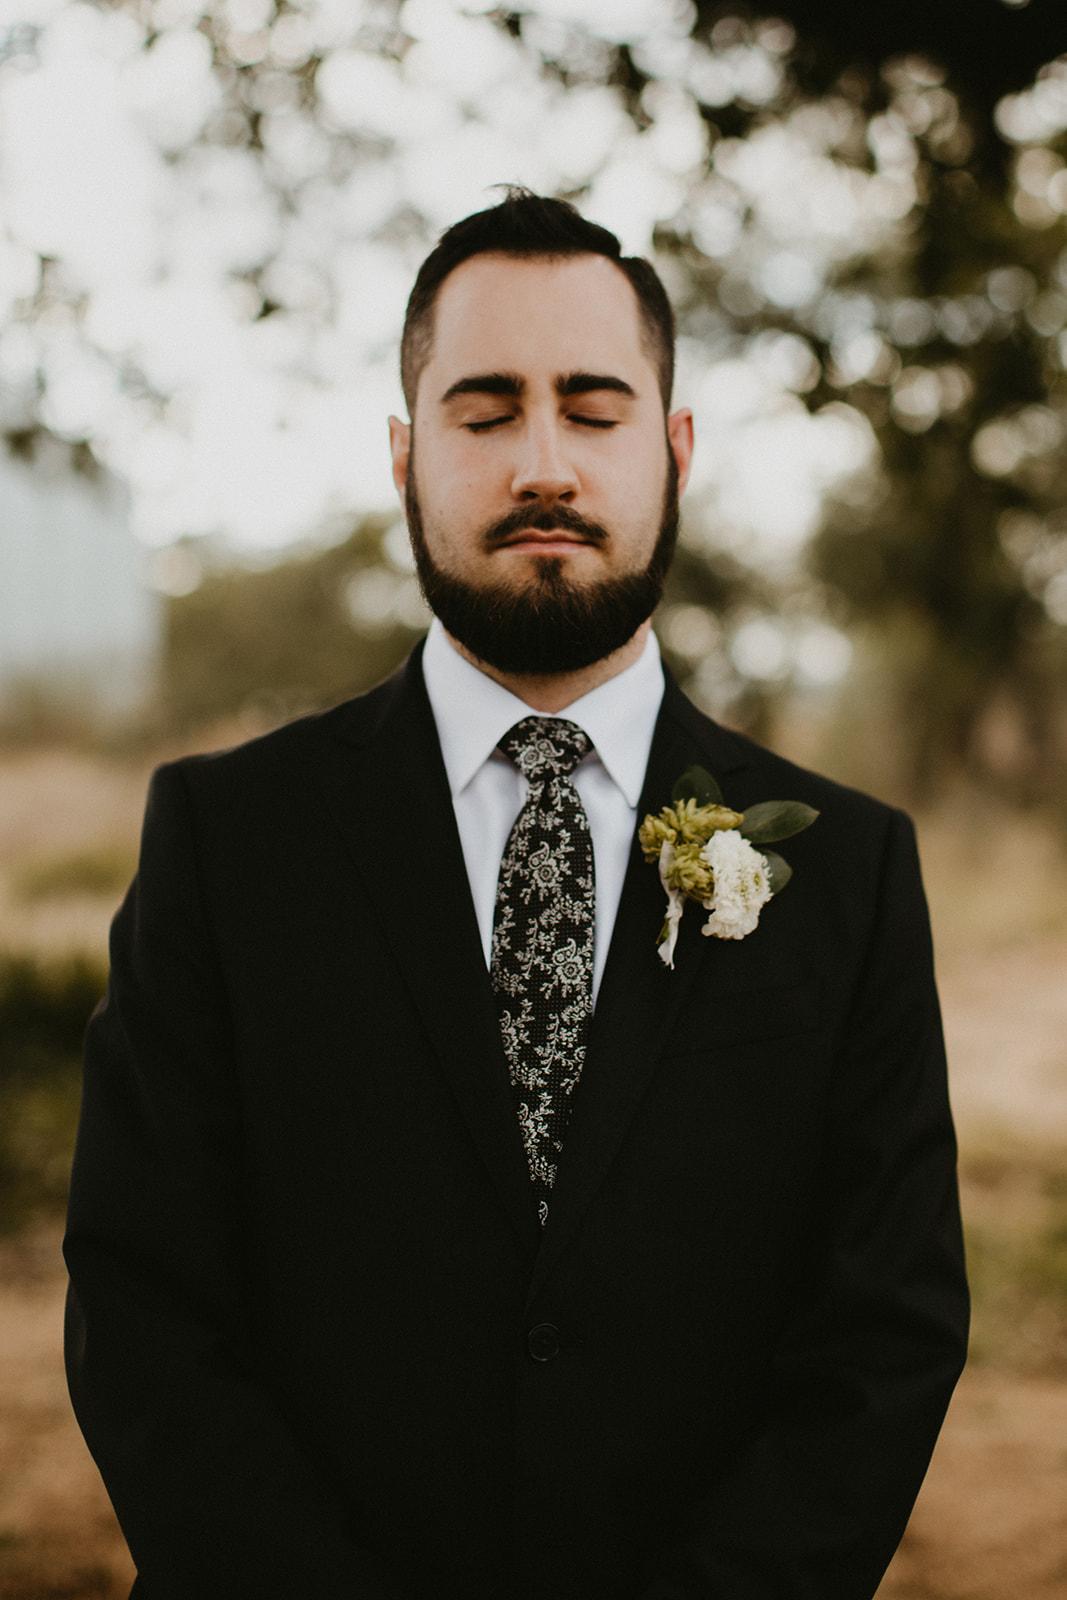 Epoch Co+ | Bride + Groom First Look | Austin Wedding Venue Prospect House | Groom Attire + Floral Tie + Hops Boutonnière  | Austin Wedding Planner